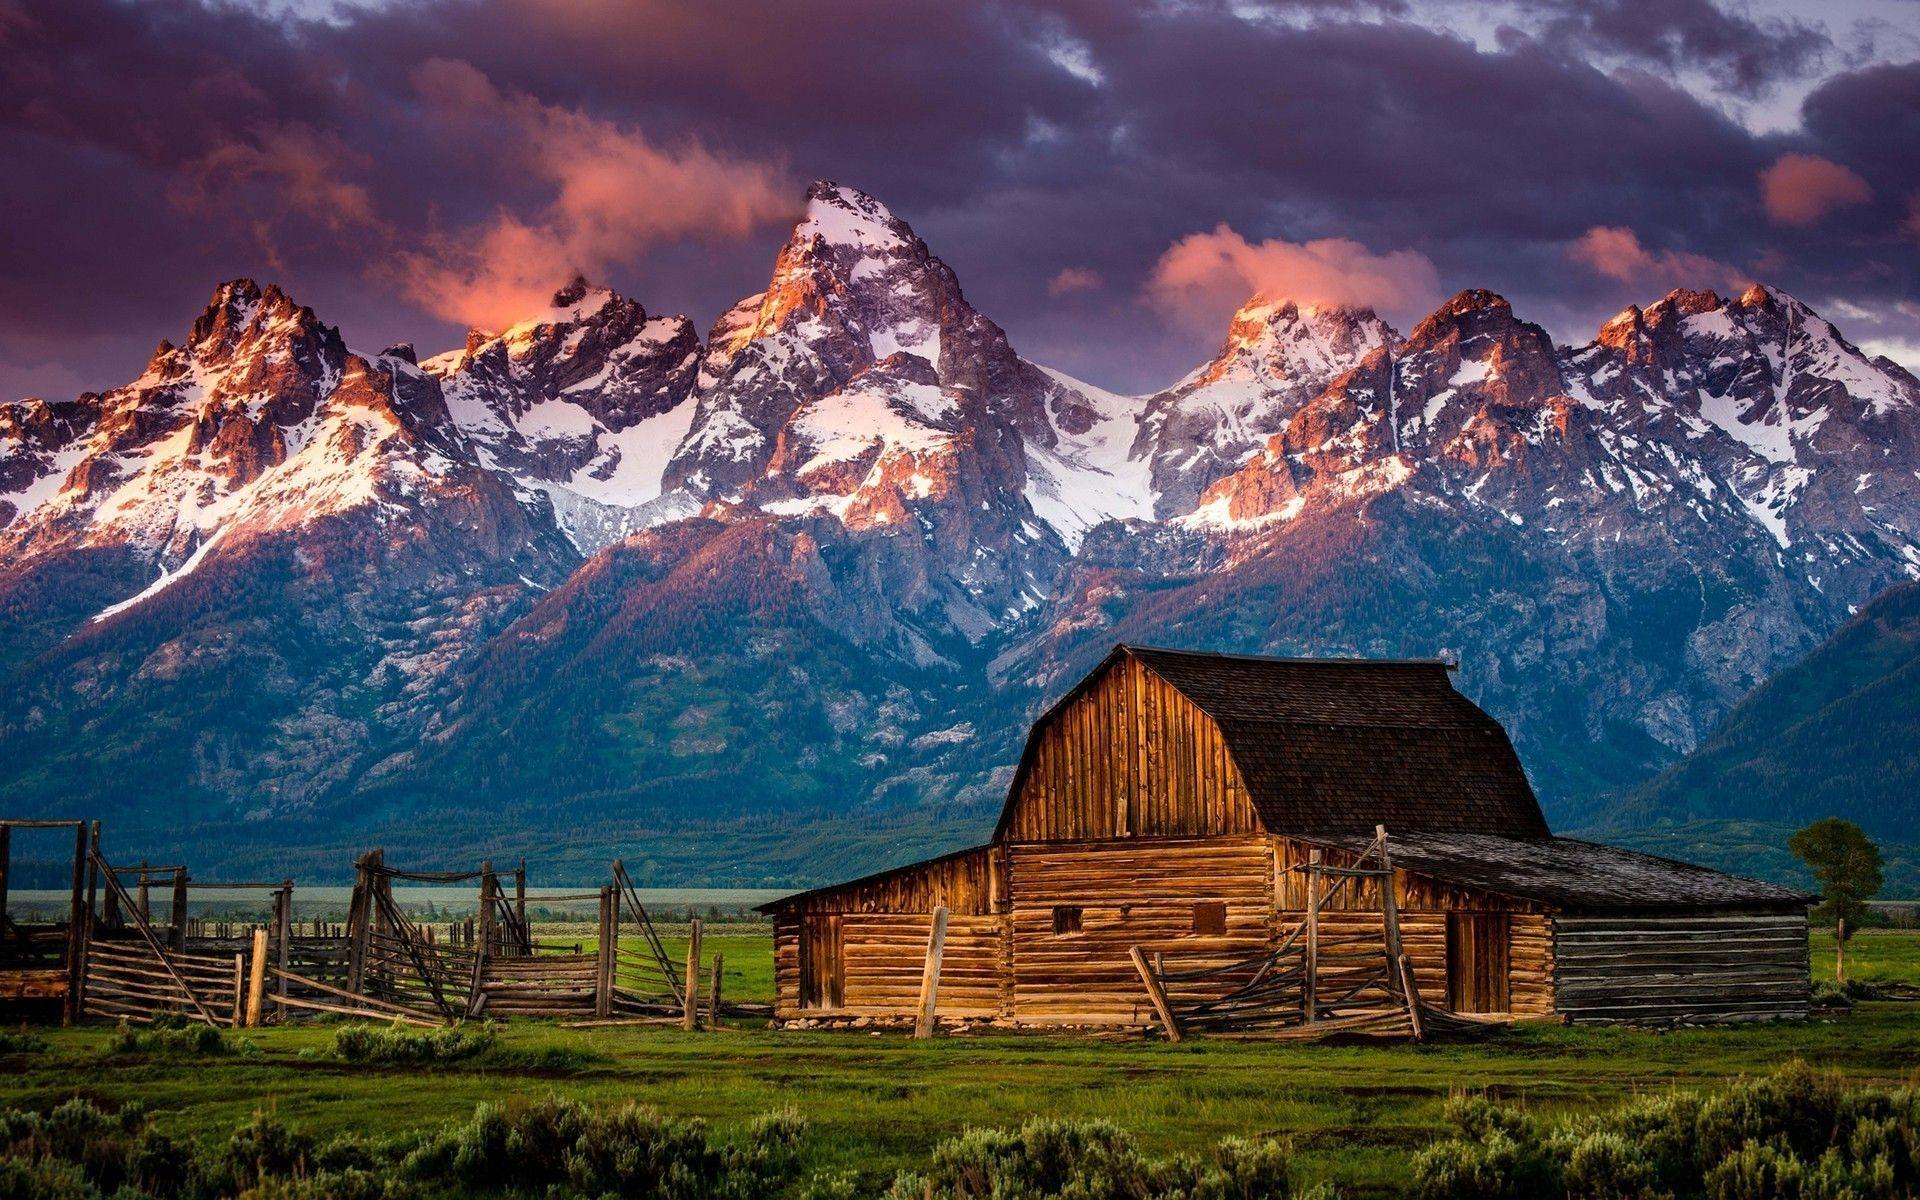 Mountain Cabin Wallpapers Top Free Mountain Cabin Backgrounds Wallpaperaccess